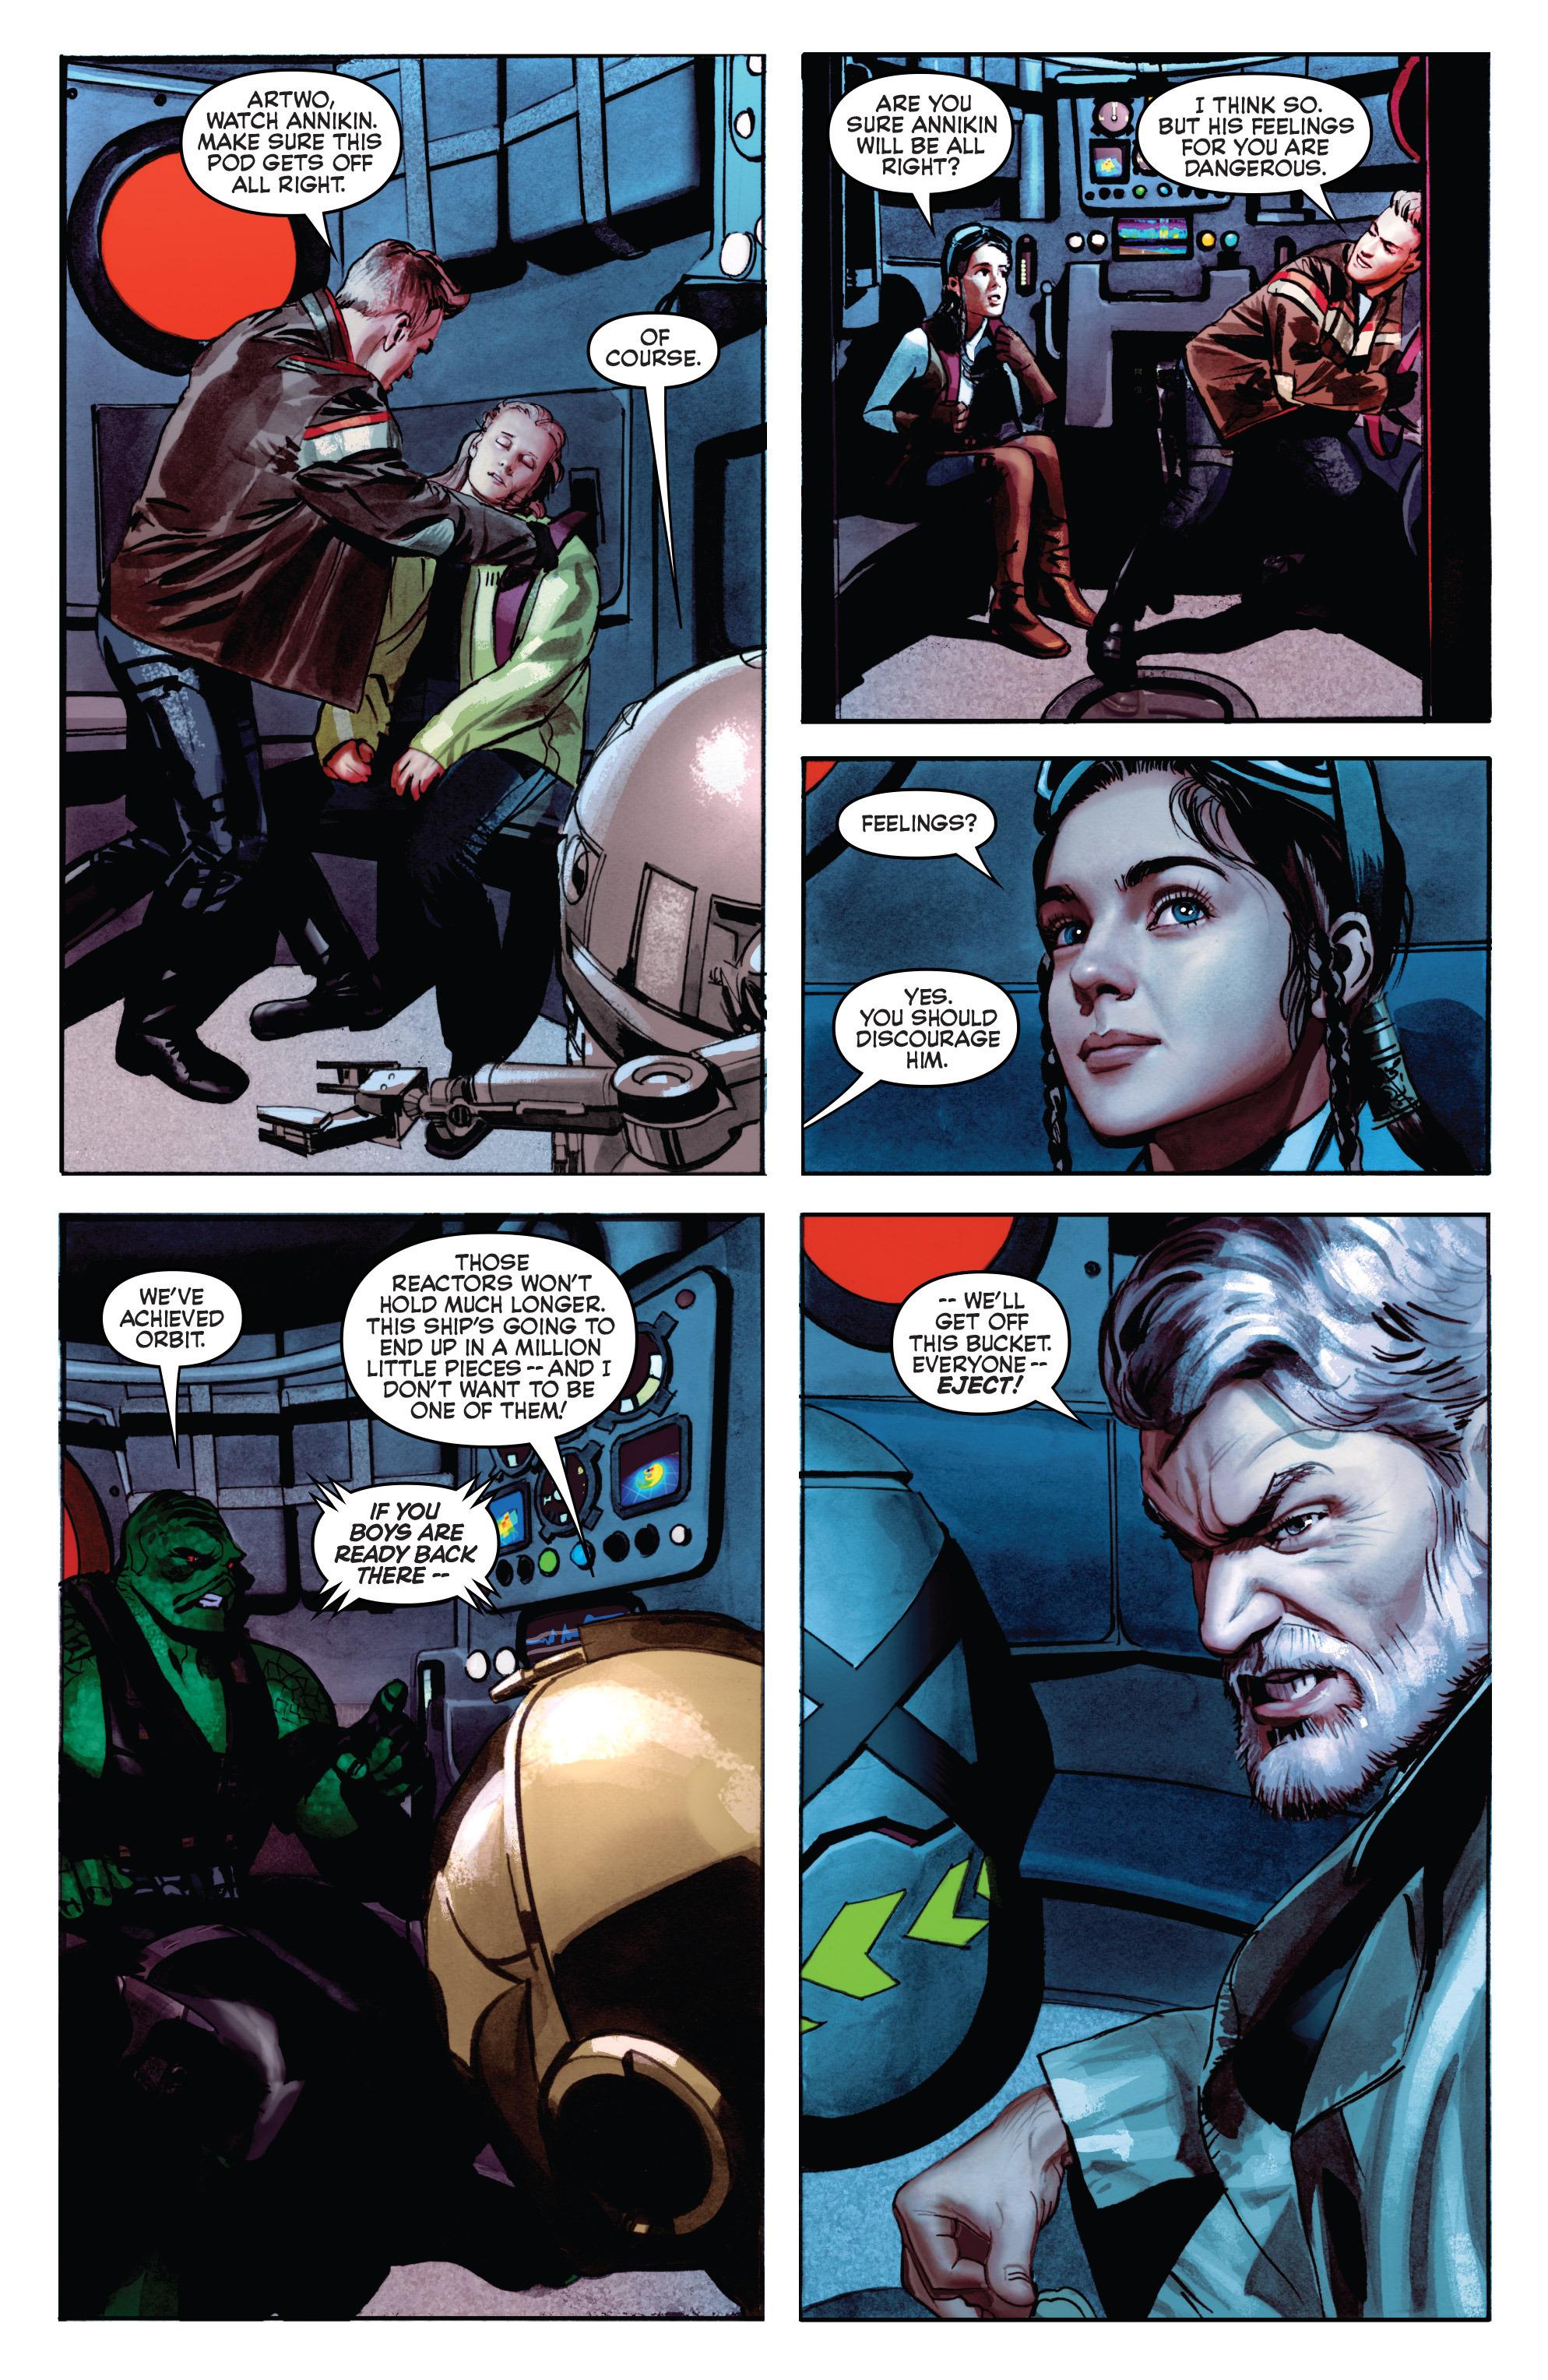 THE STAR WARS comic (2015, Marvel edition) Vol.7 9